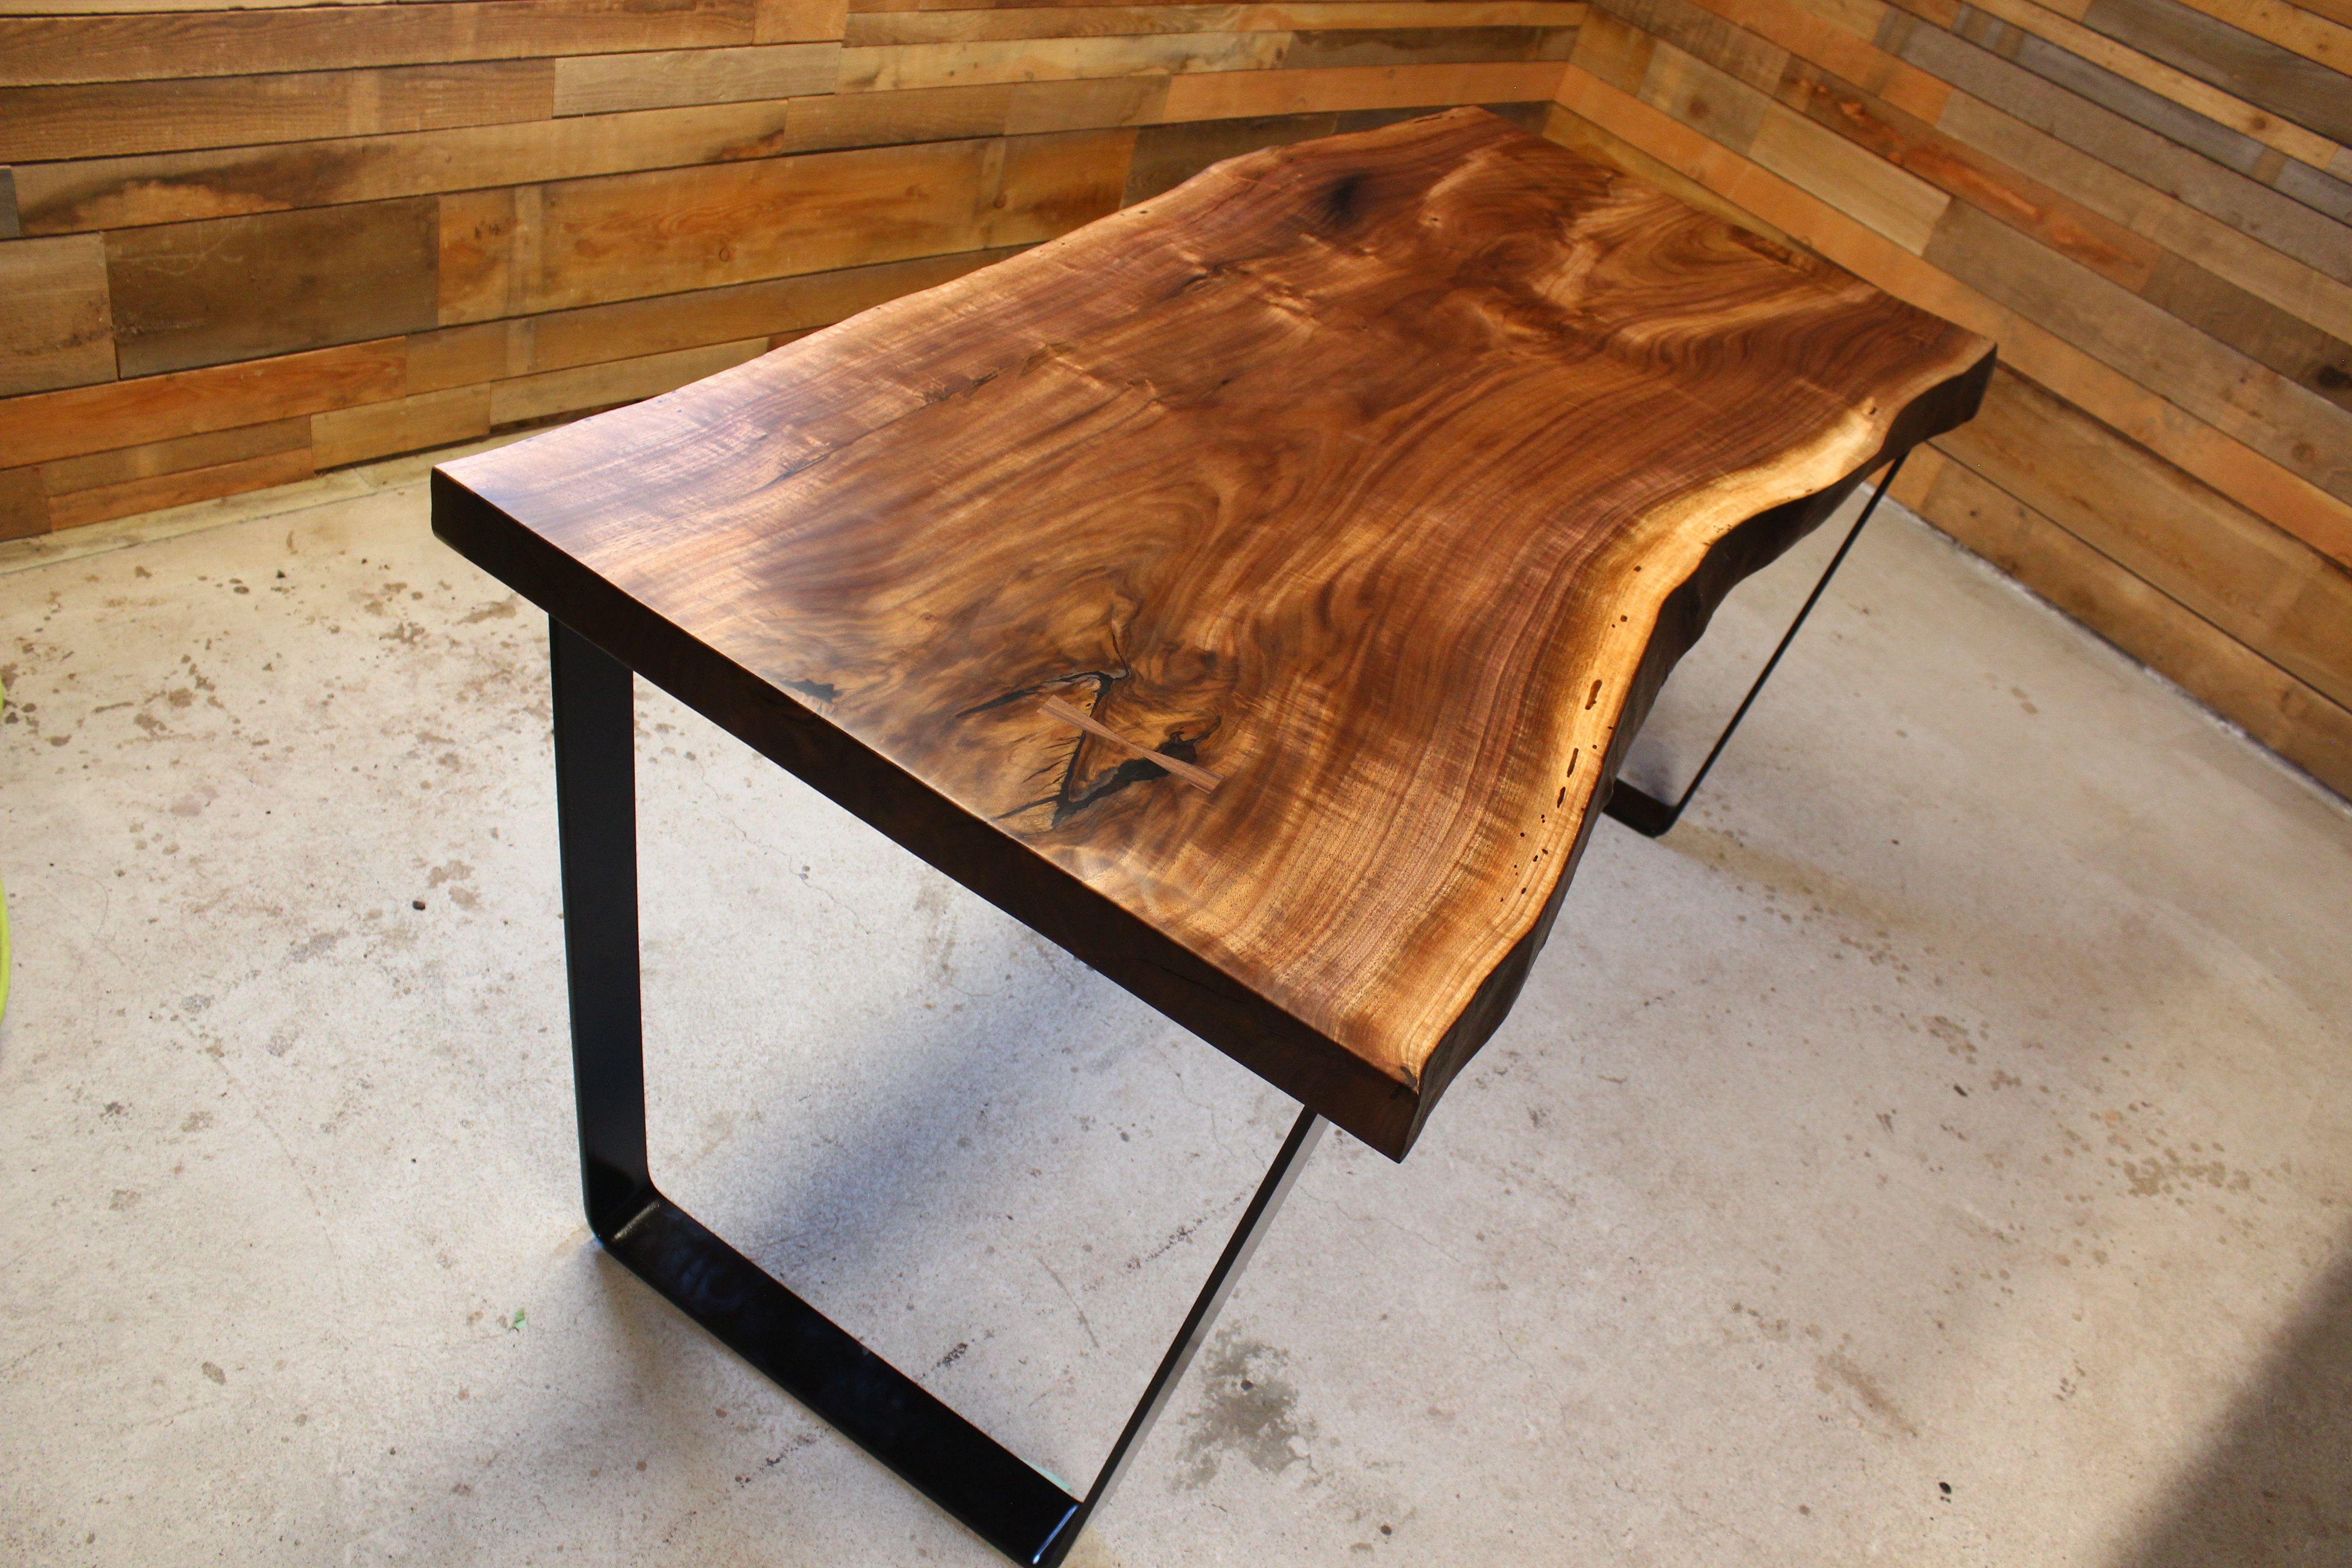 Black Walnut Live Edge Desk Table Wood Handmade Wood Slab Custom Made To Order In 2020 Live Edge Desk Live Edge Furniture Live Edge Table